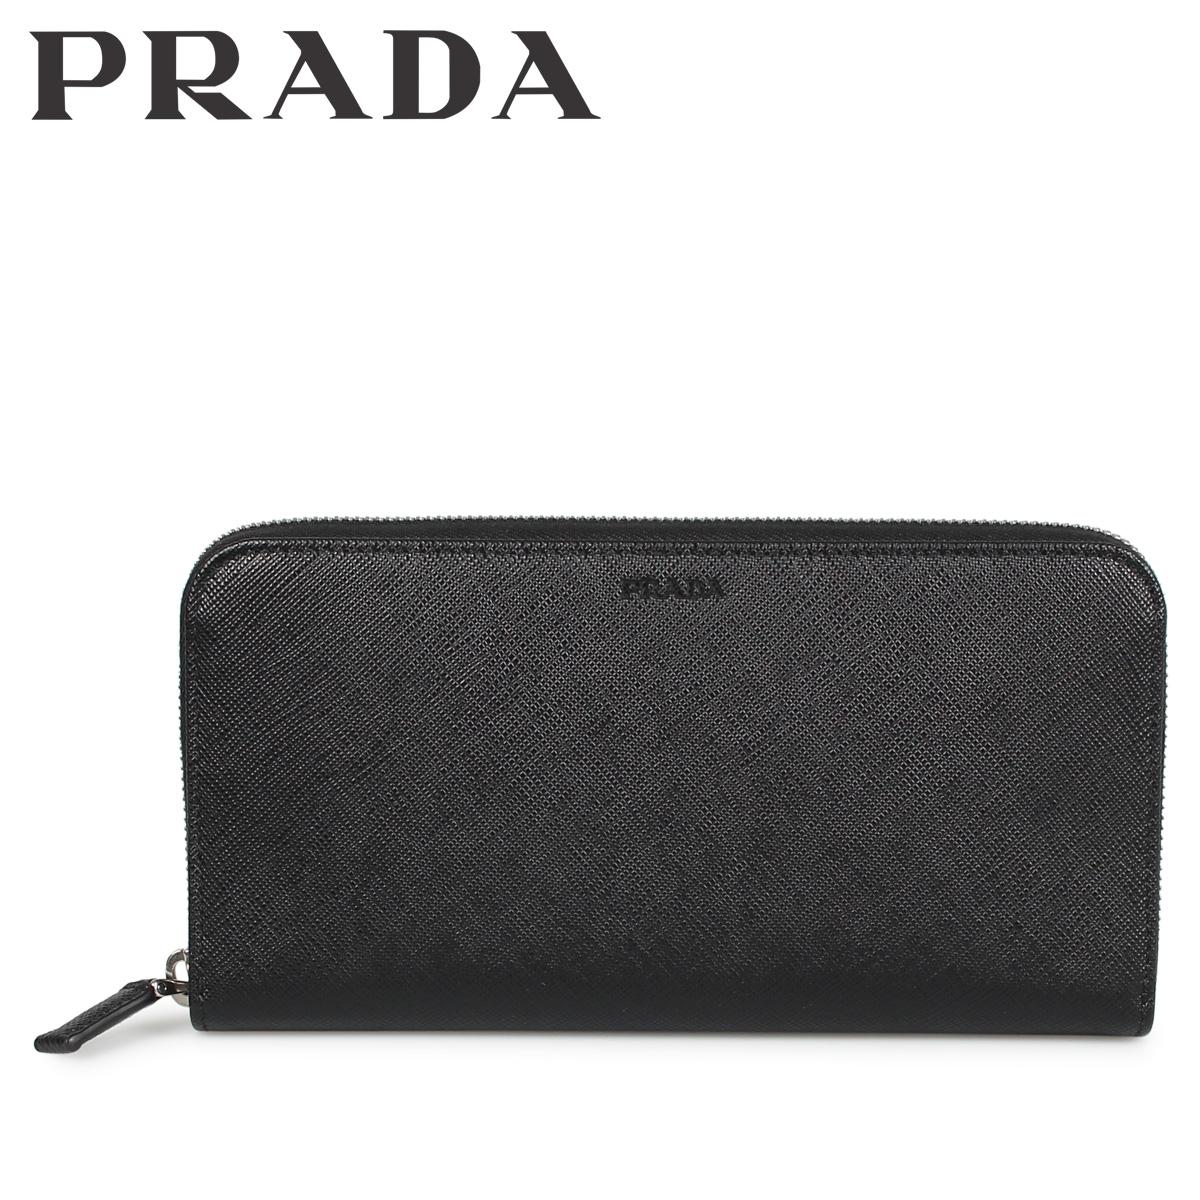 PRADA ZIP AROUND プラダ 財布 長財布 メンズ サフィアーノ ラウンドファスナー ブラック 黒 2ML317053